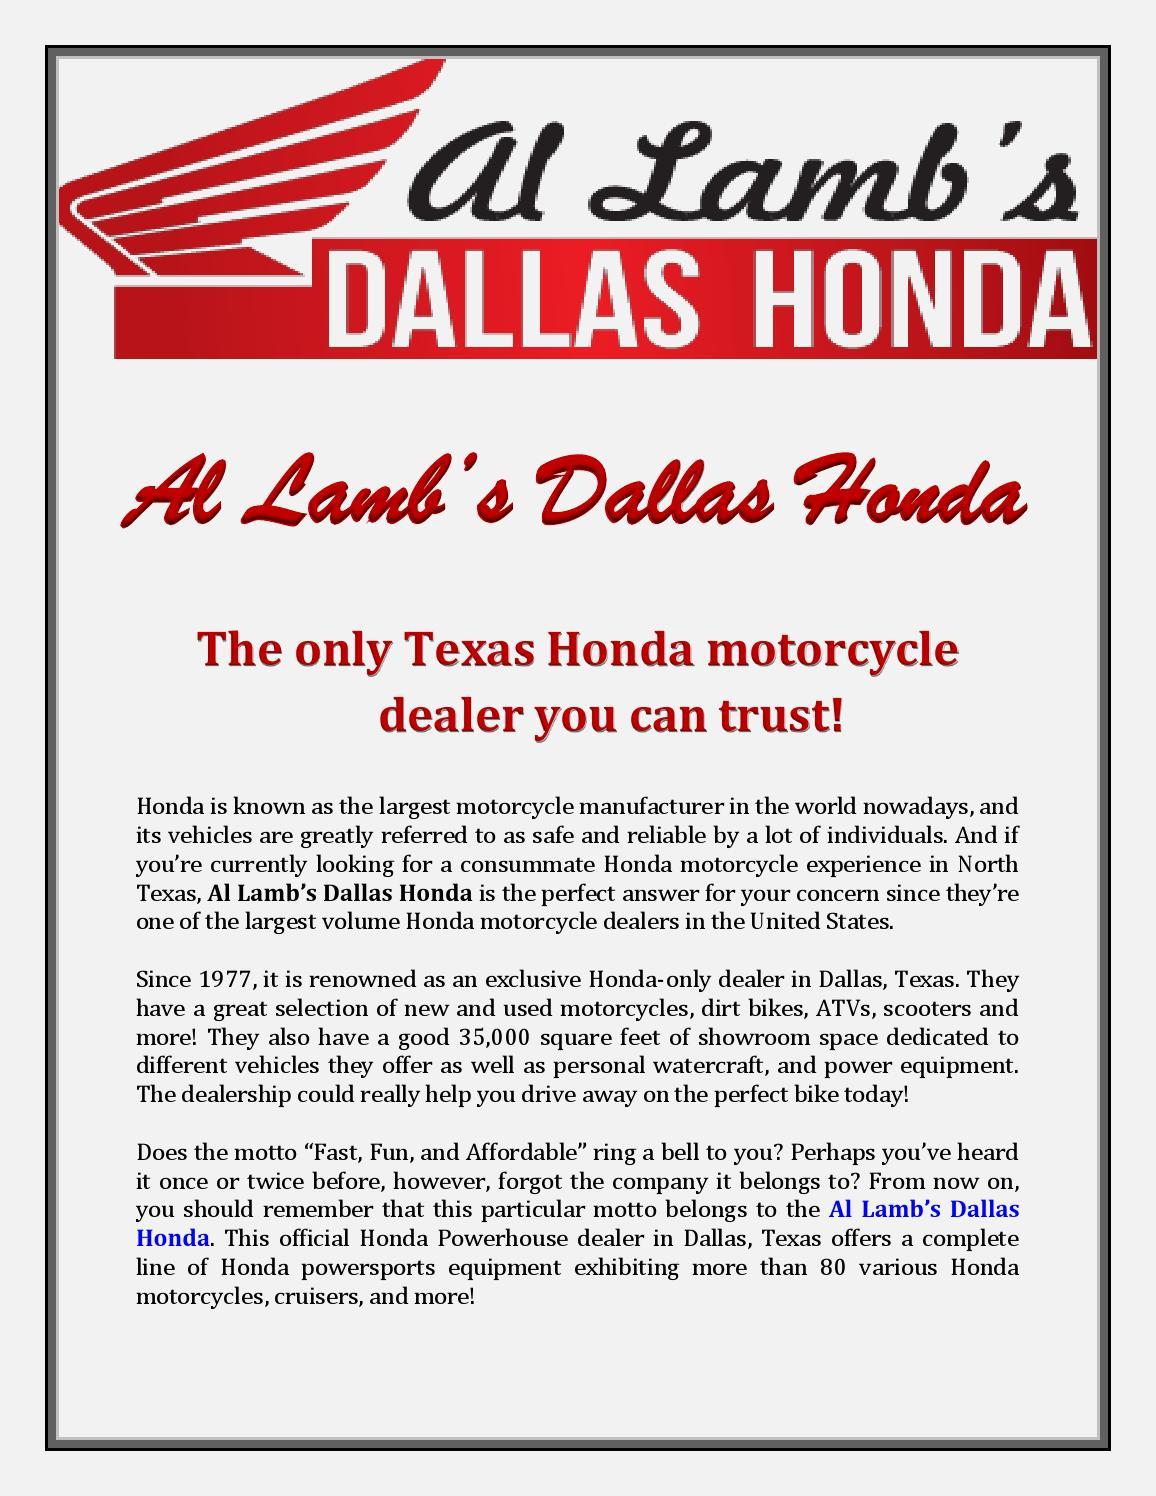 al lamb's dallas honda: the only texas honda motorcycle dealer you